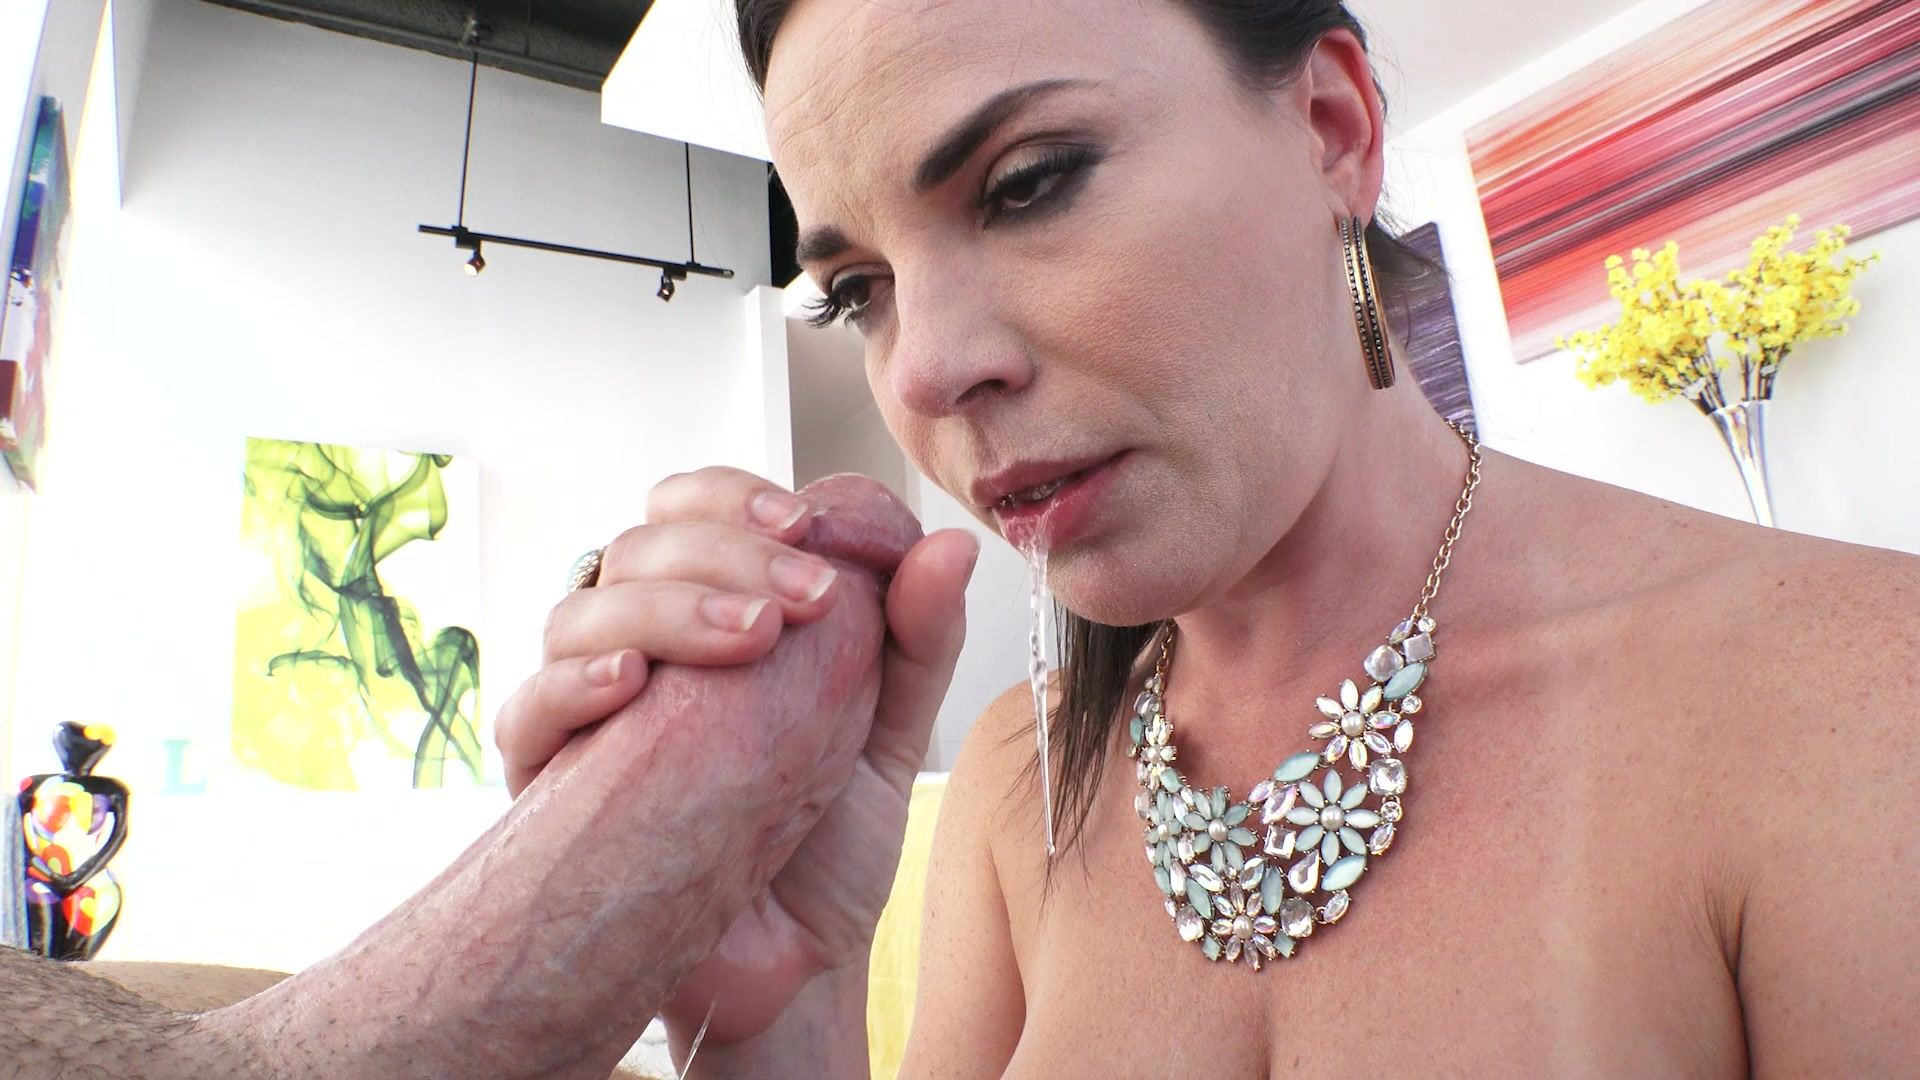 Porn pic Fat girl sexy pic